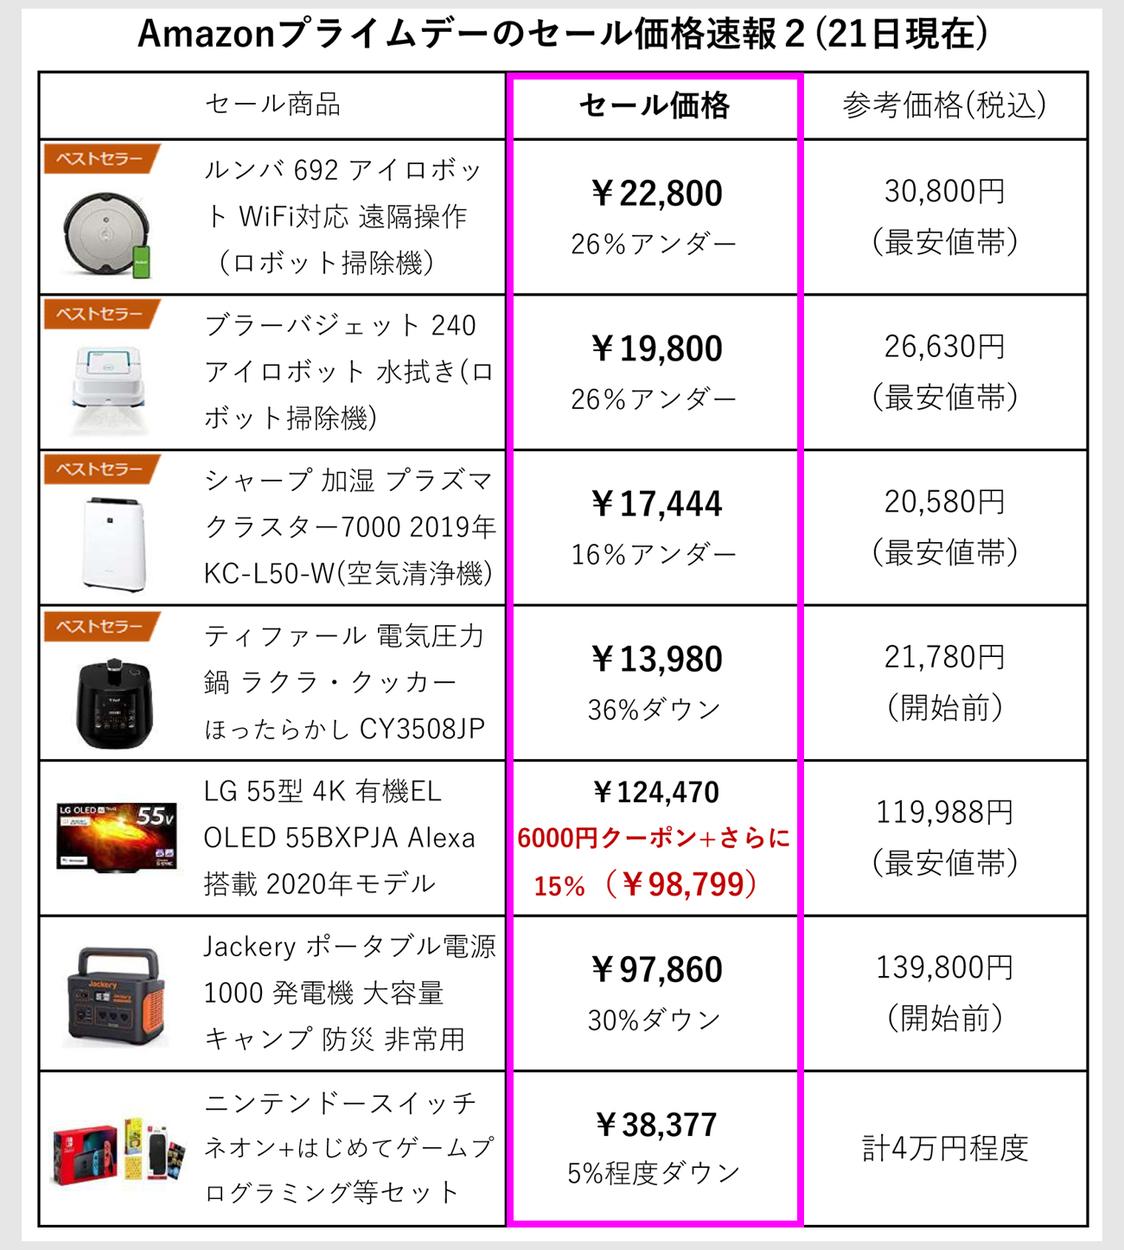 f:id:nobujirou:20210621161209j:plain